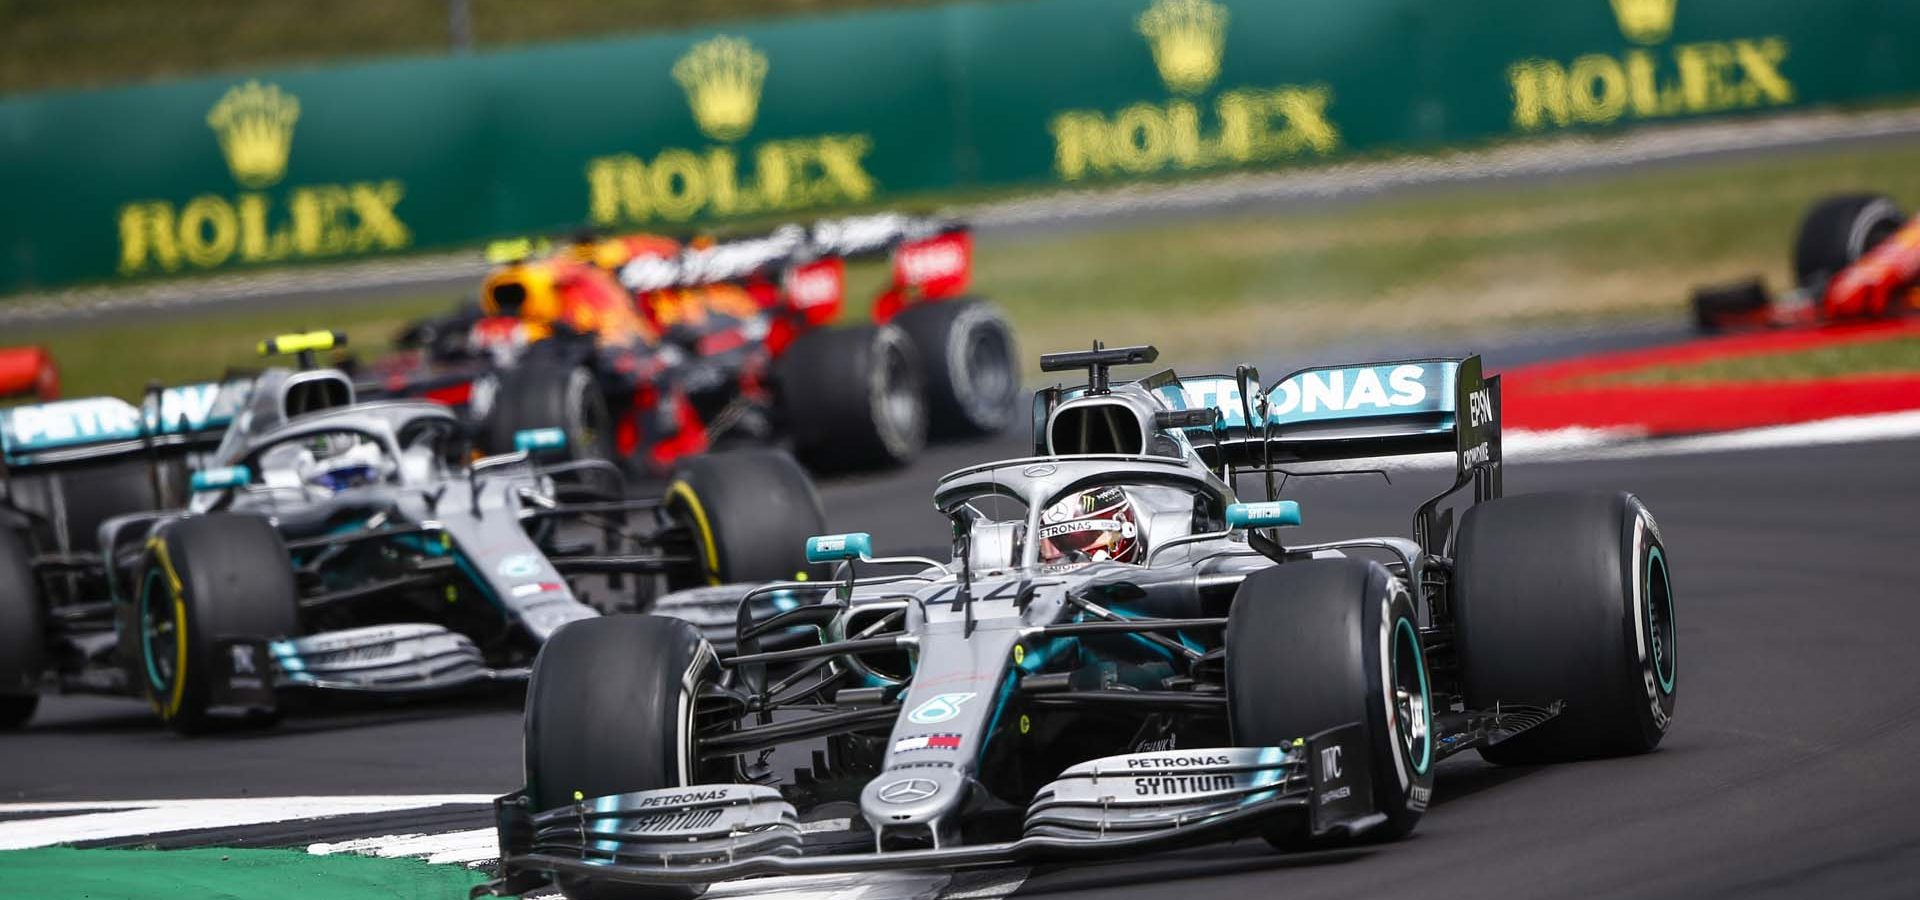 2019 British Grand Prix, Sunday - LAT Images Lewis Hamilton, followed by Valtteri Bottas Mercedes